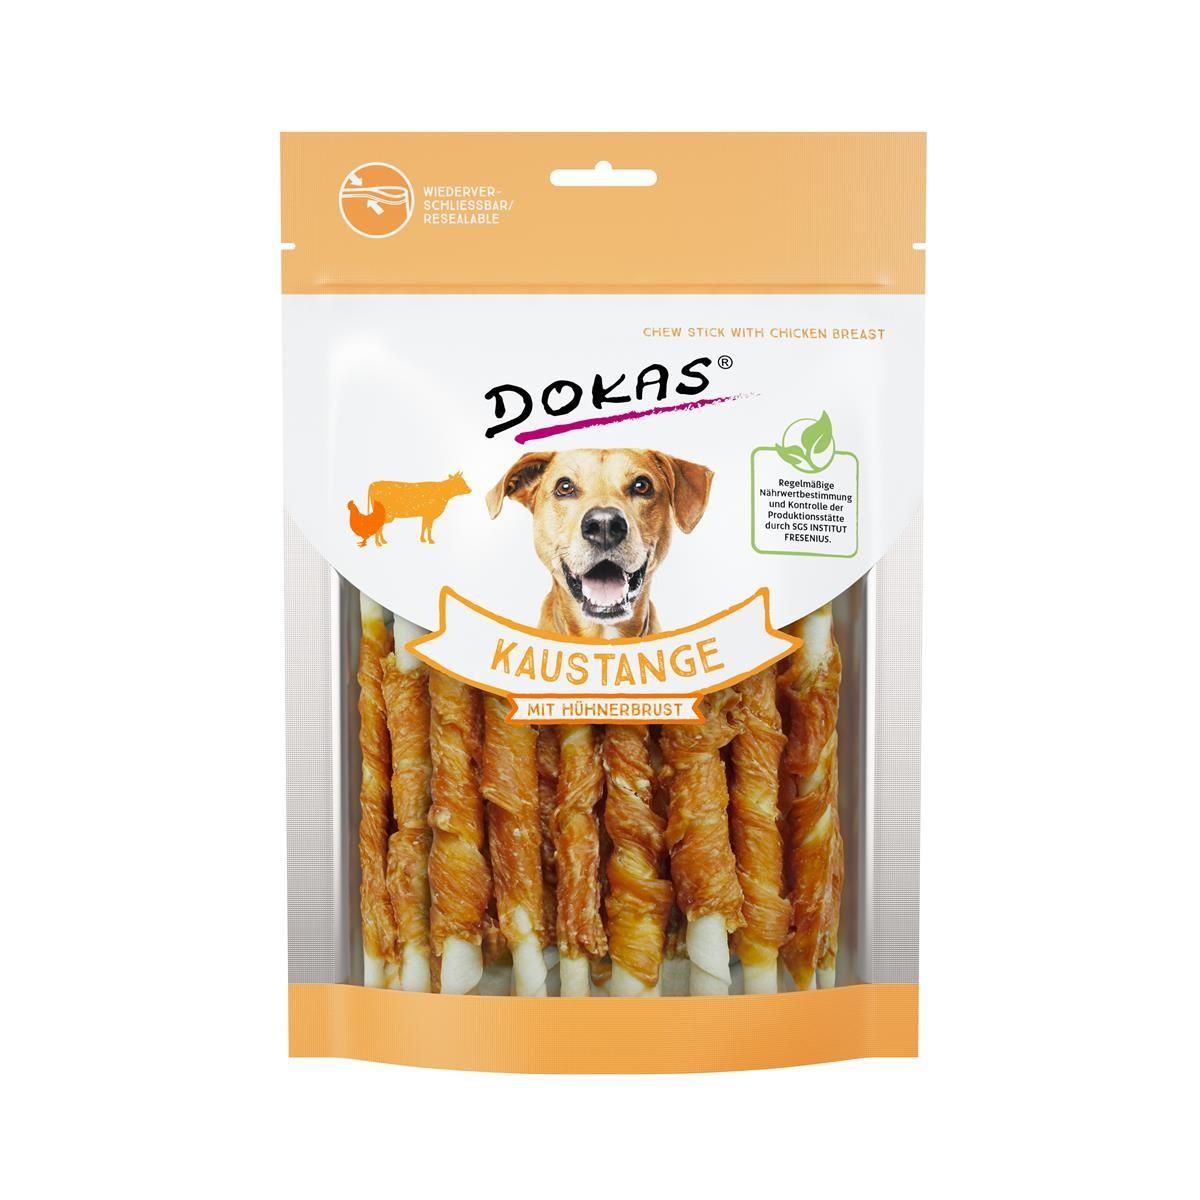 Dokas Dog Snack Kaustange mit Hühnerbrust 200g Hundesnack